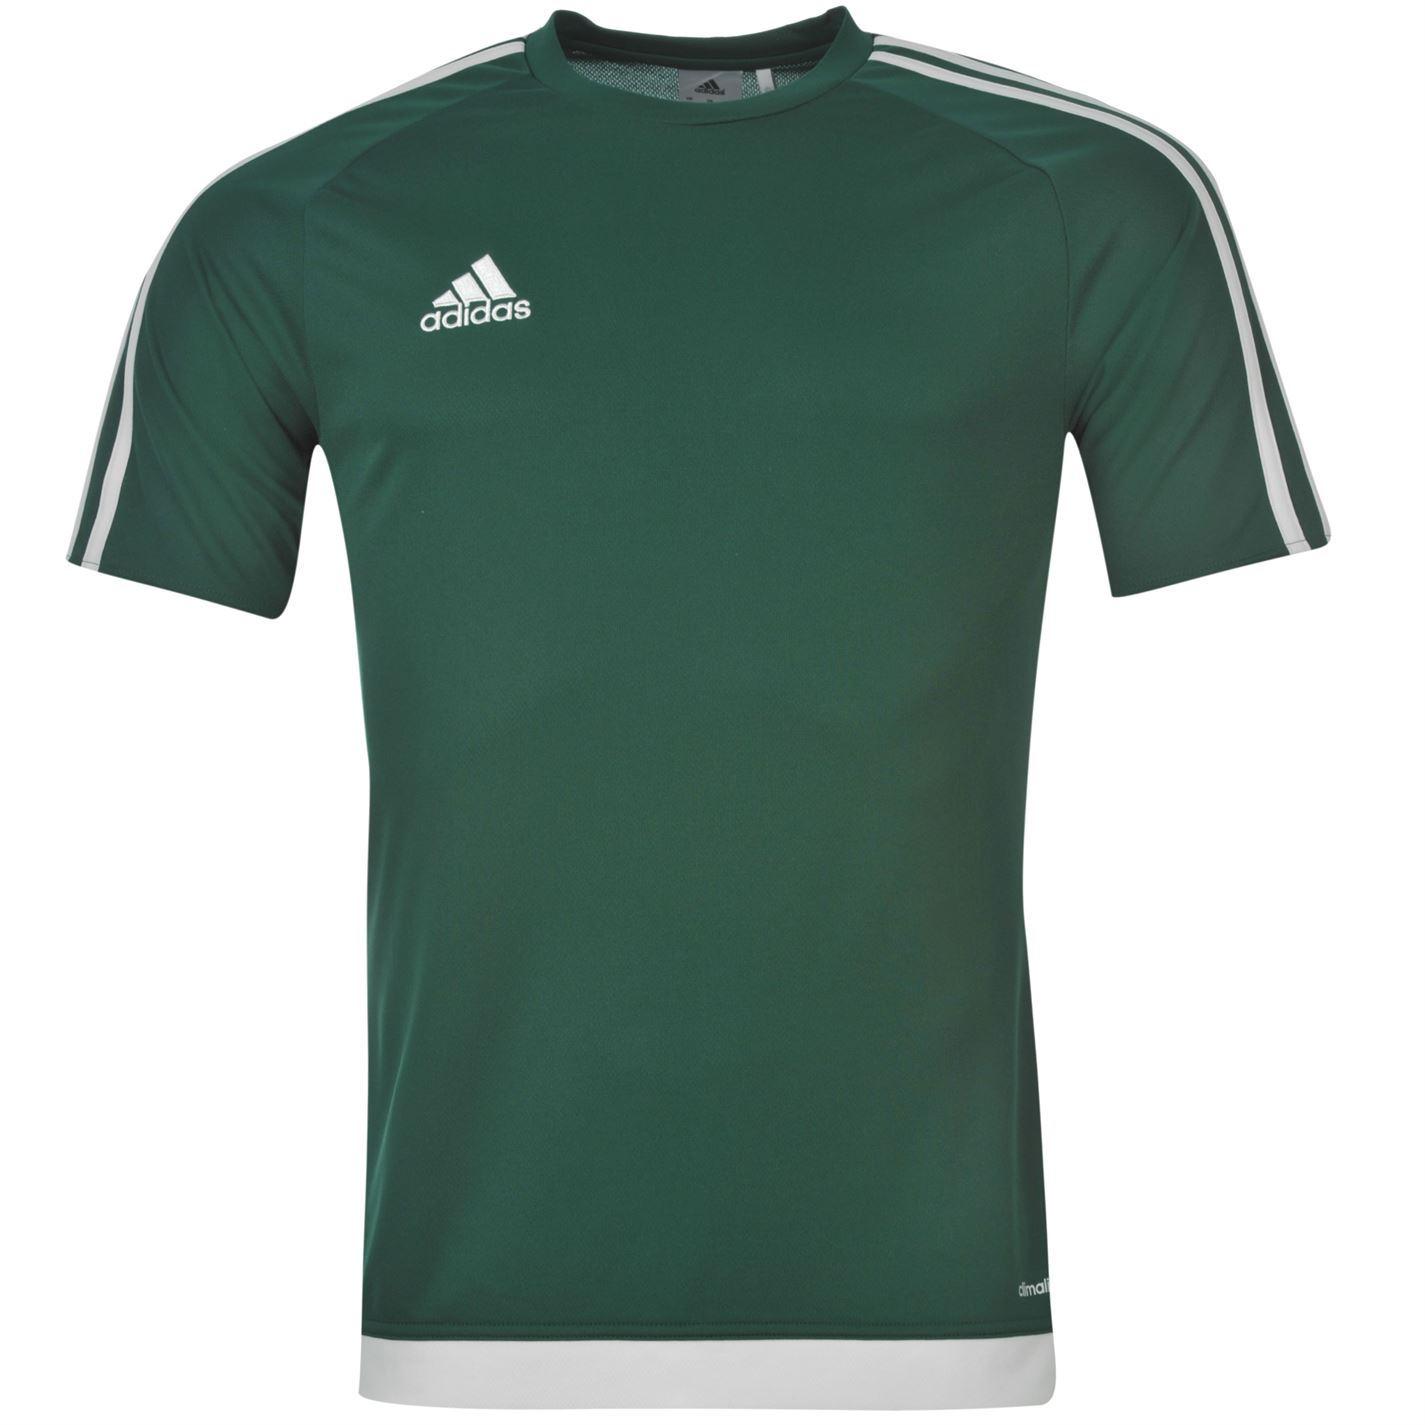 adidas 3 stripe estro climalite t shirt mens col green. Black Bedroom Furniture Sets. Home Design Ideas